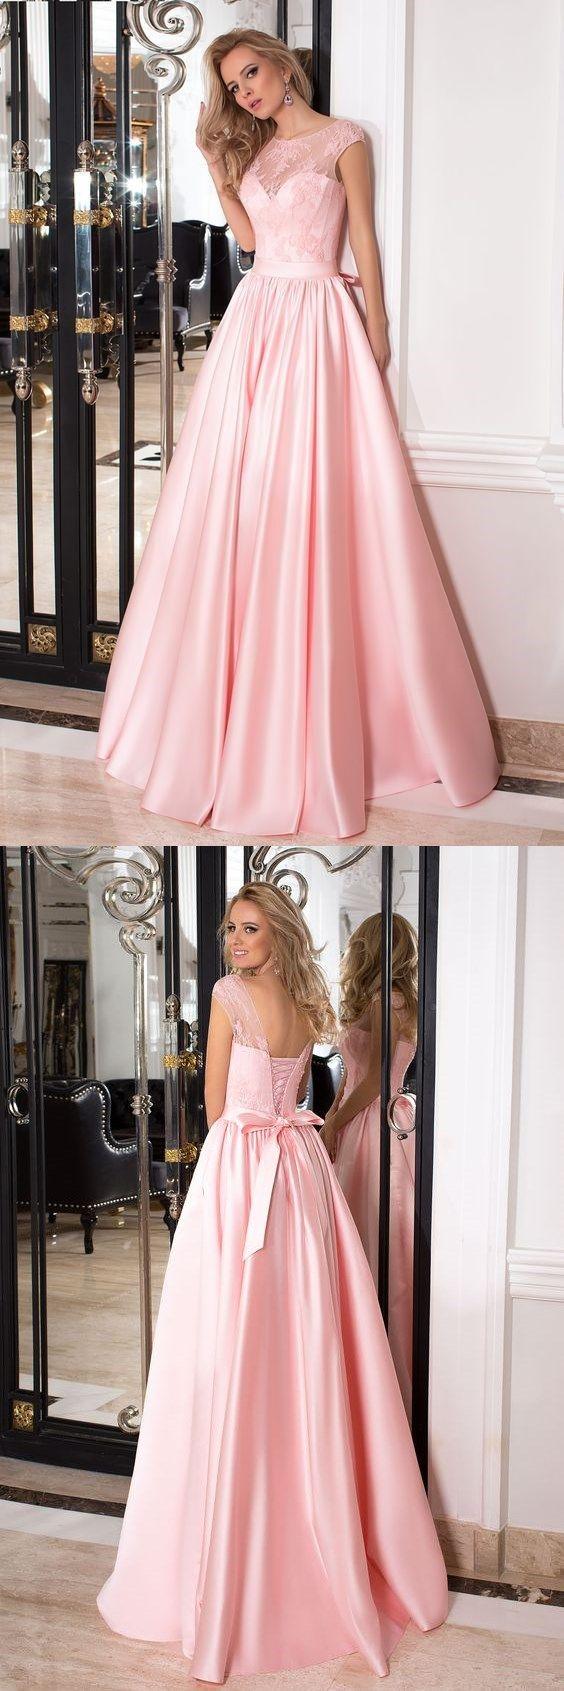 Elegant A-line Pink Long Satin Prom Dress Party Dress | Dresses ...